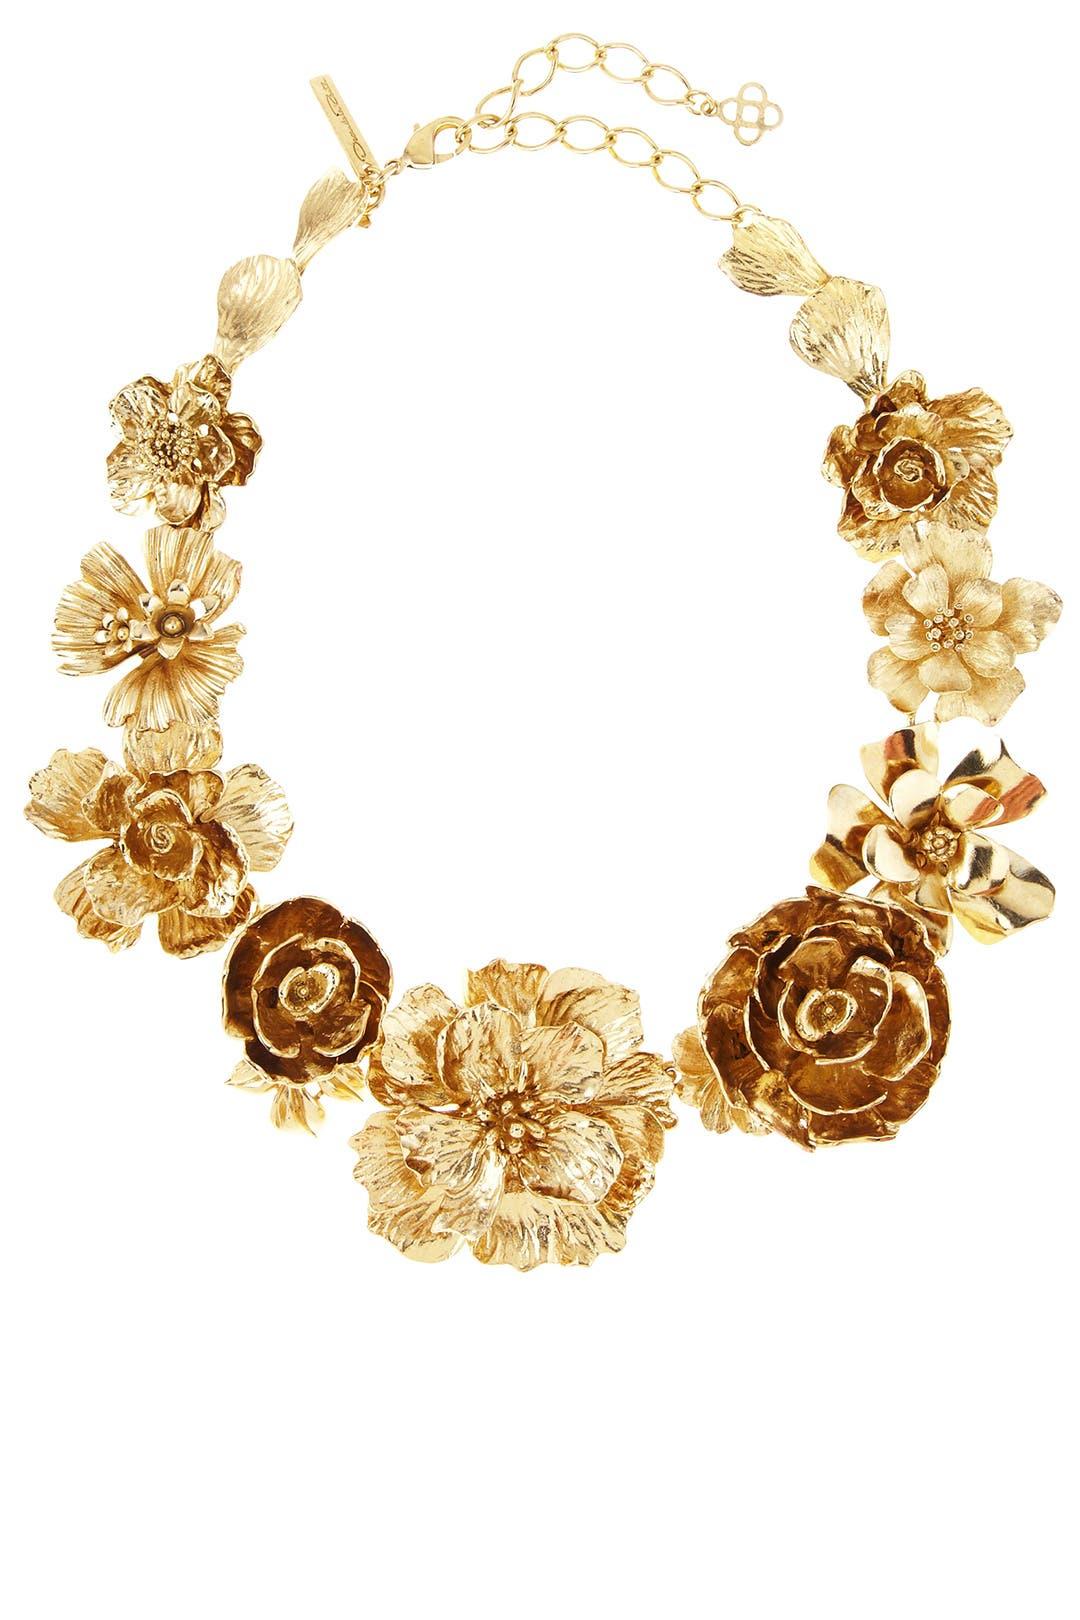 763dd1ae49f Necklaces - Oscar de la Renta Great selection and prices for Wedding ...